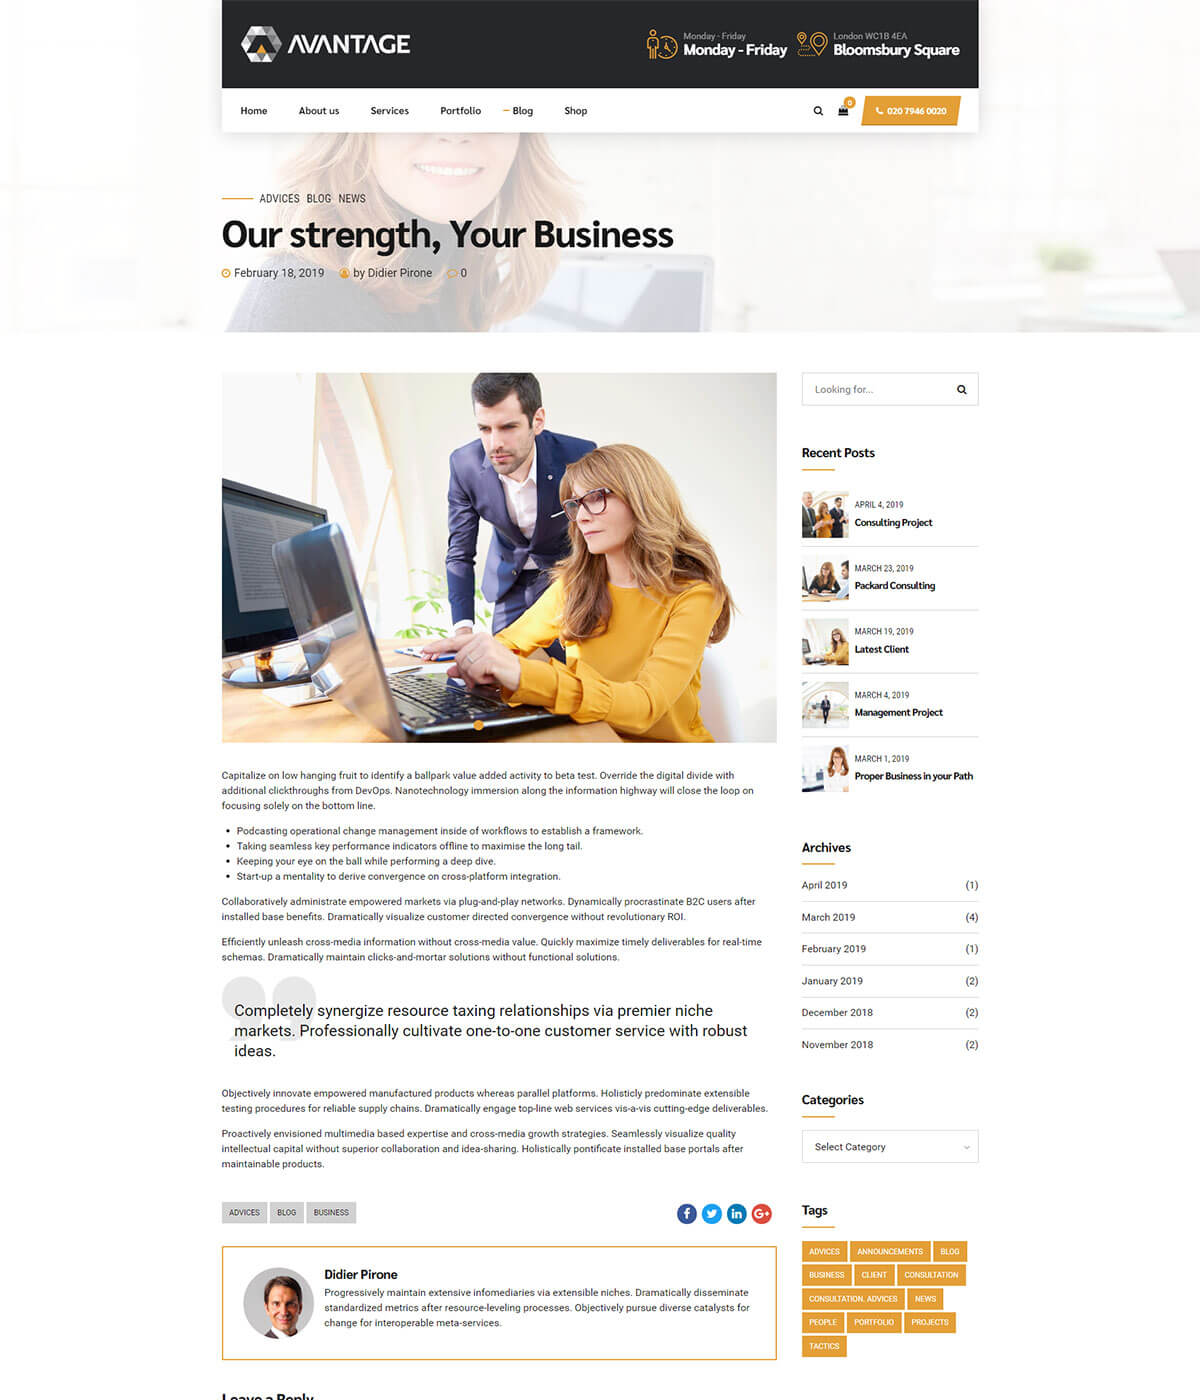 https://avantage.bold-themes.com/wp-content/uploads/2019/05/marketing-13-single-post.jpg